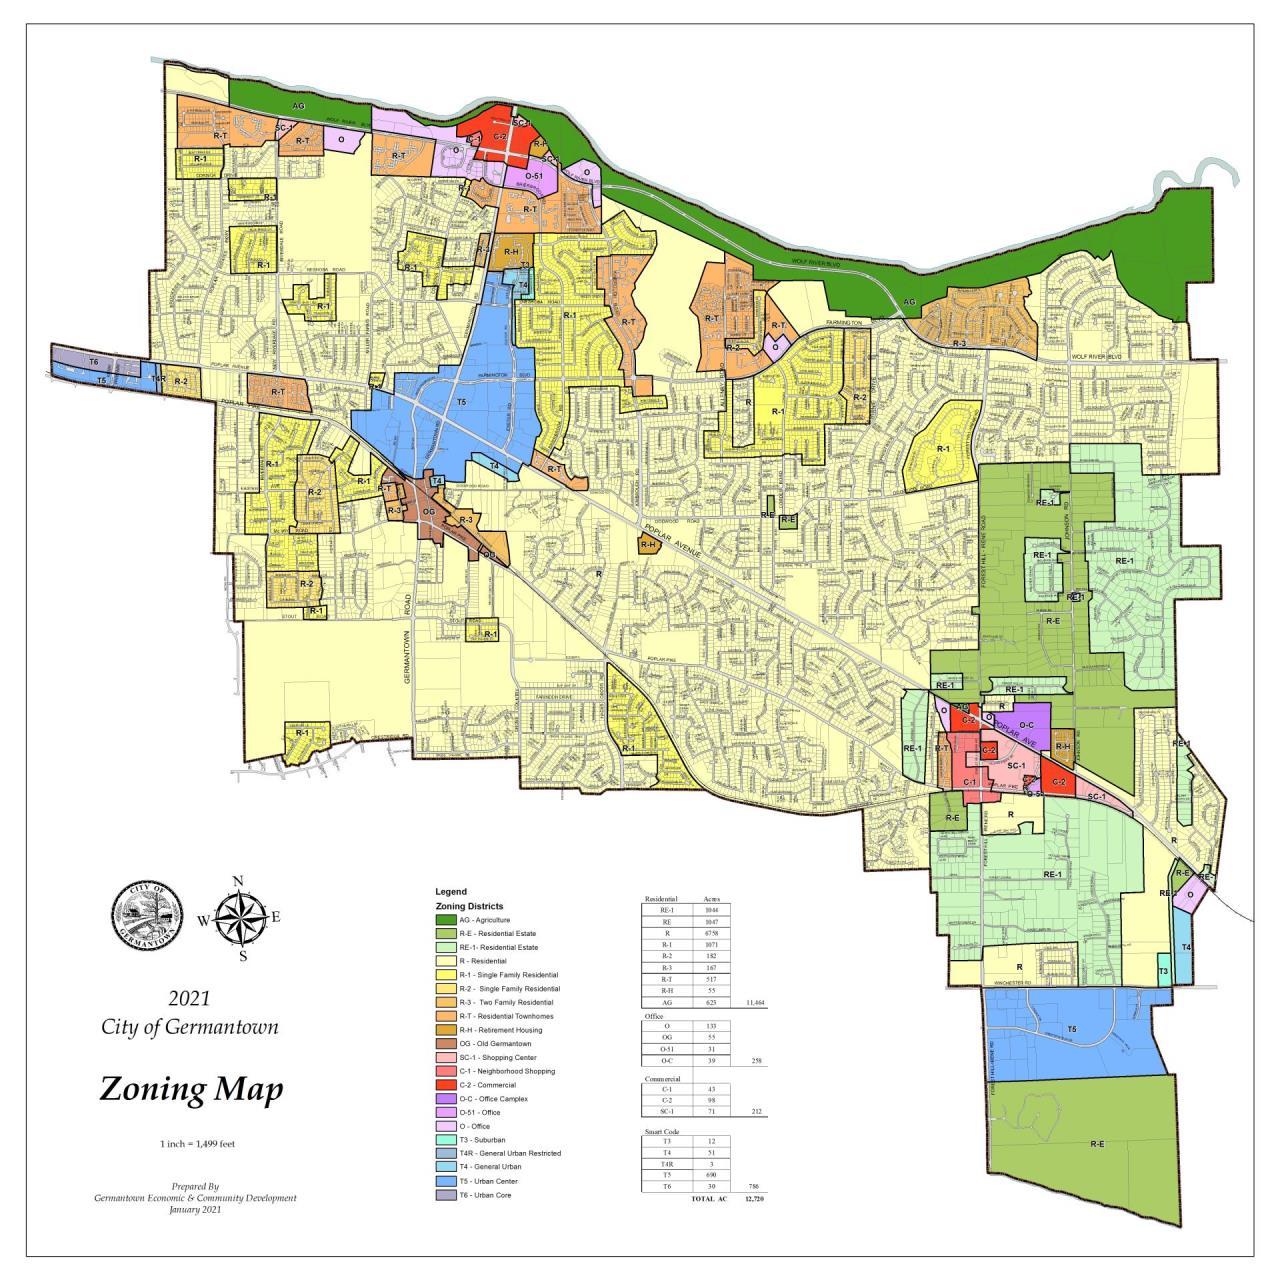 Germantown Zoning Map   City of Germantown on